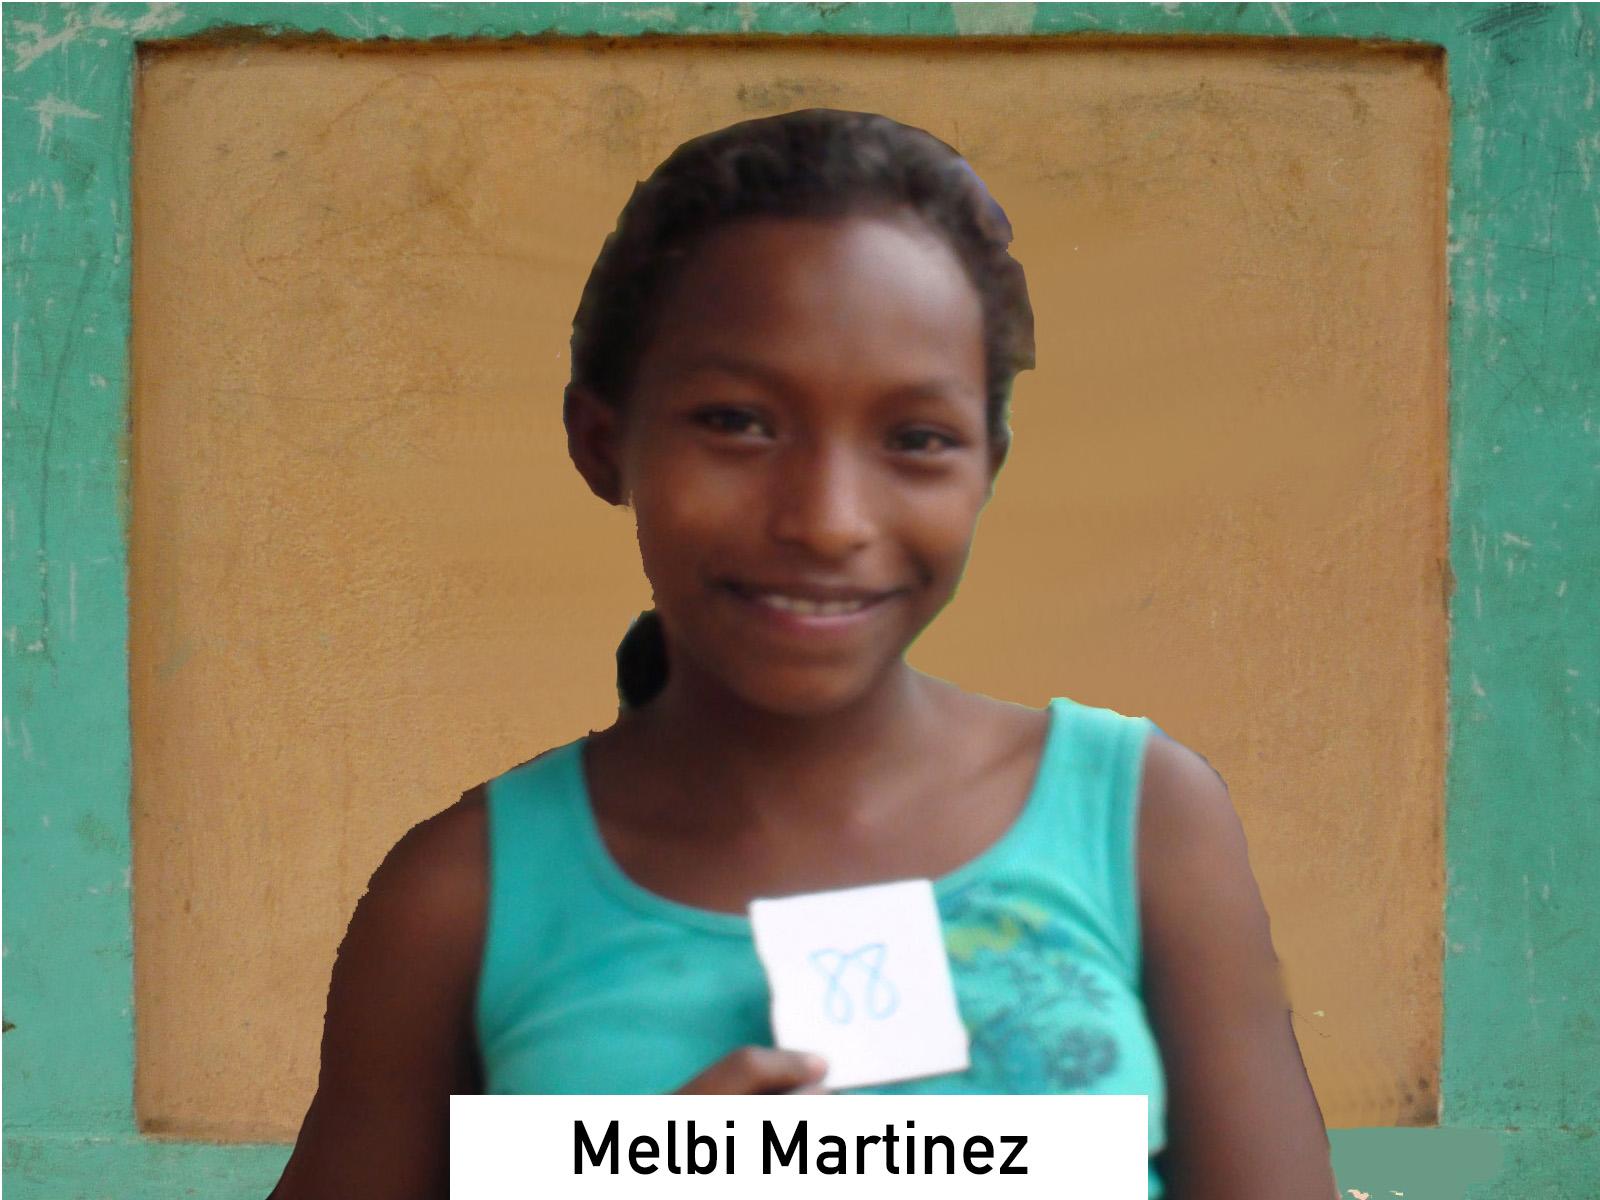 088 - Melbi Martinez.jpg